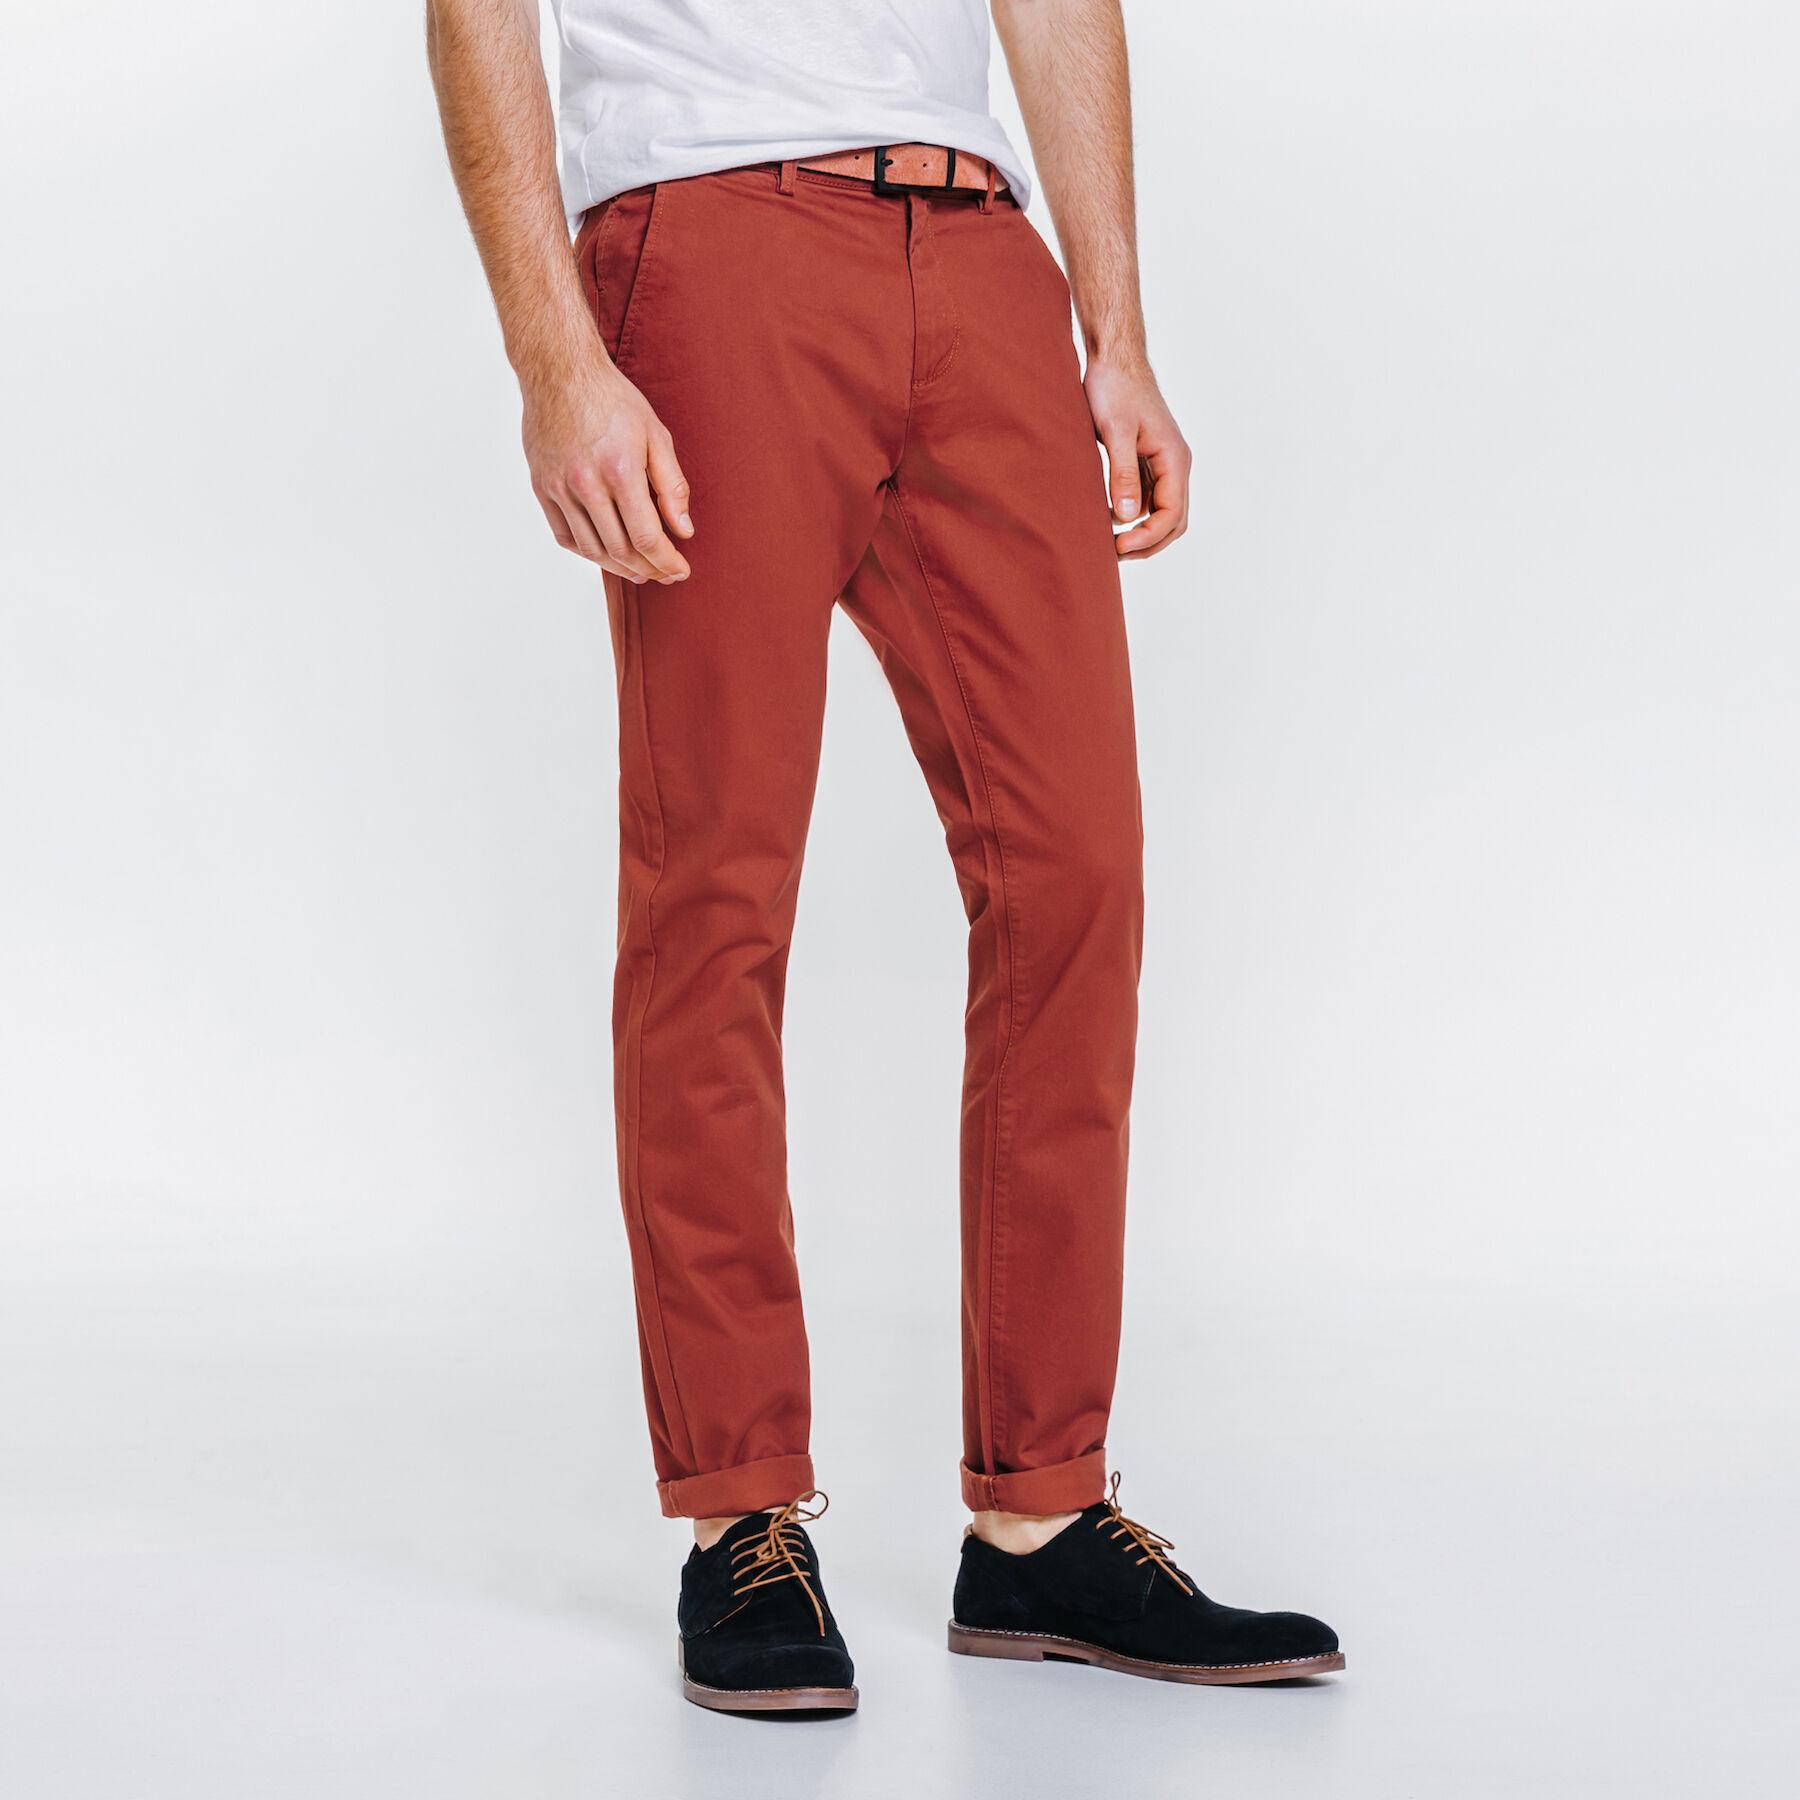 9c5a623ed0f7f Pantalon chino slim coton stretch Rouge Moyen Homme - Jules